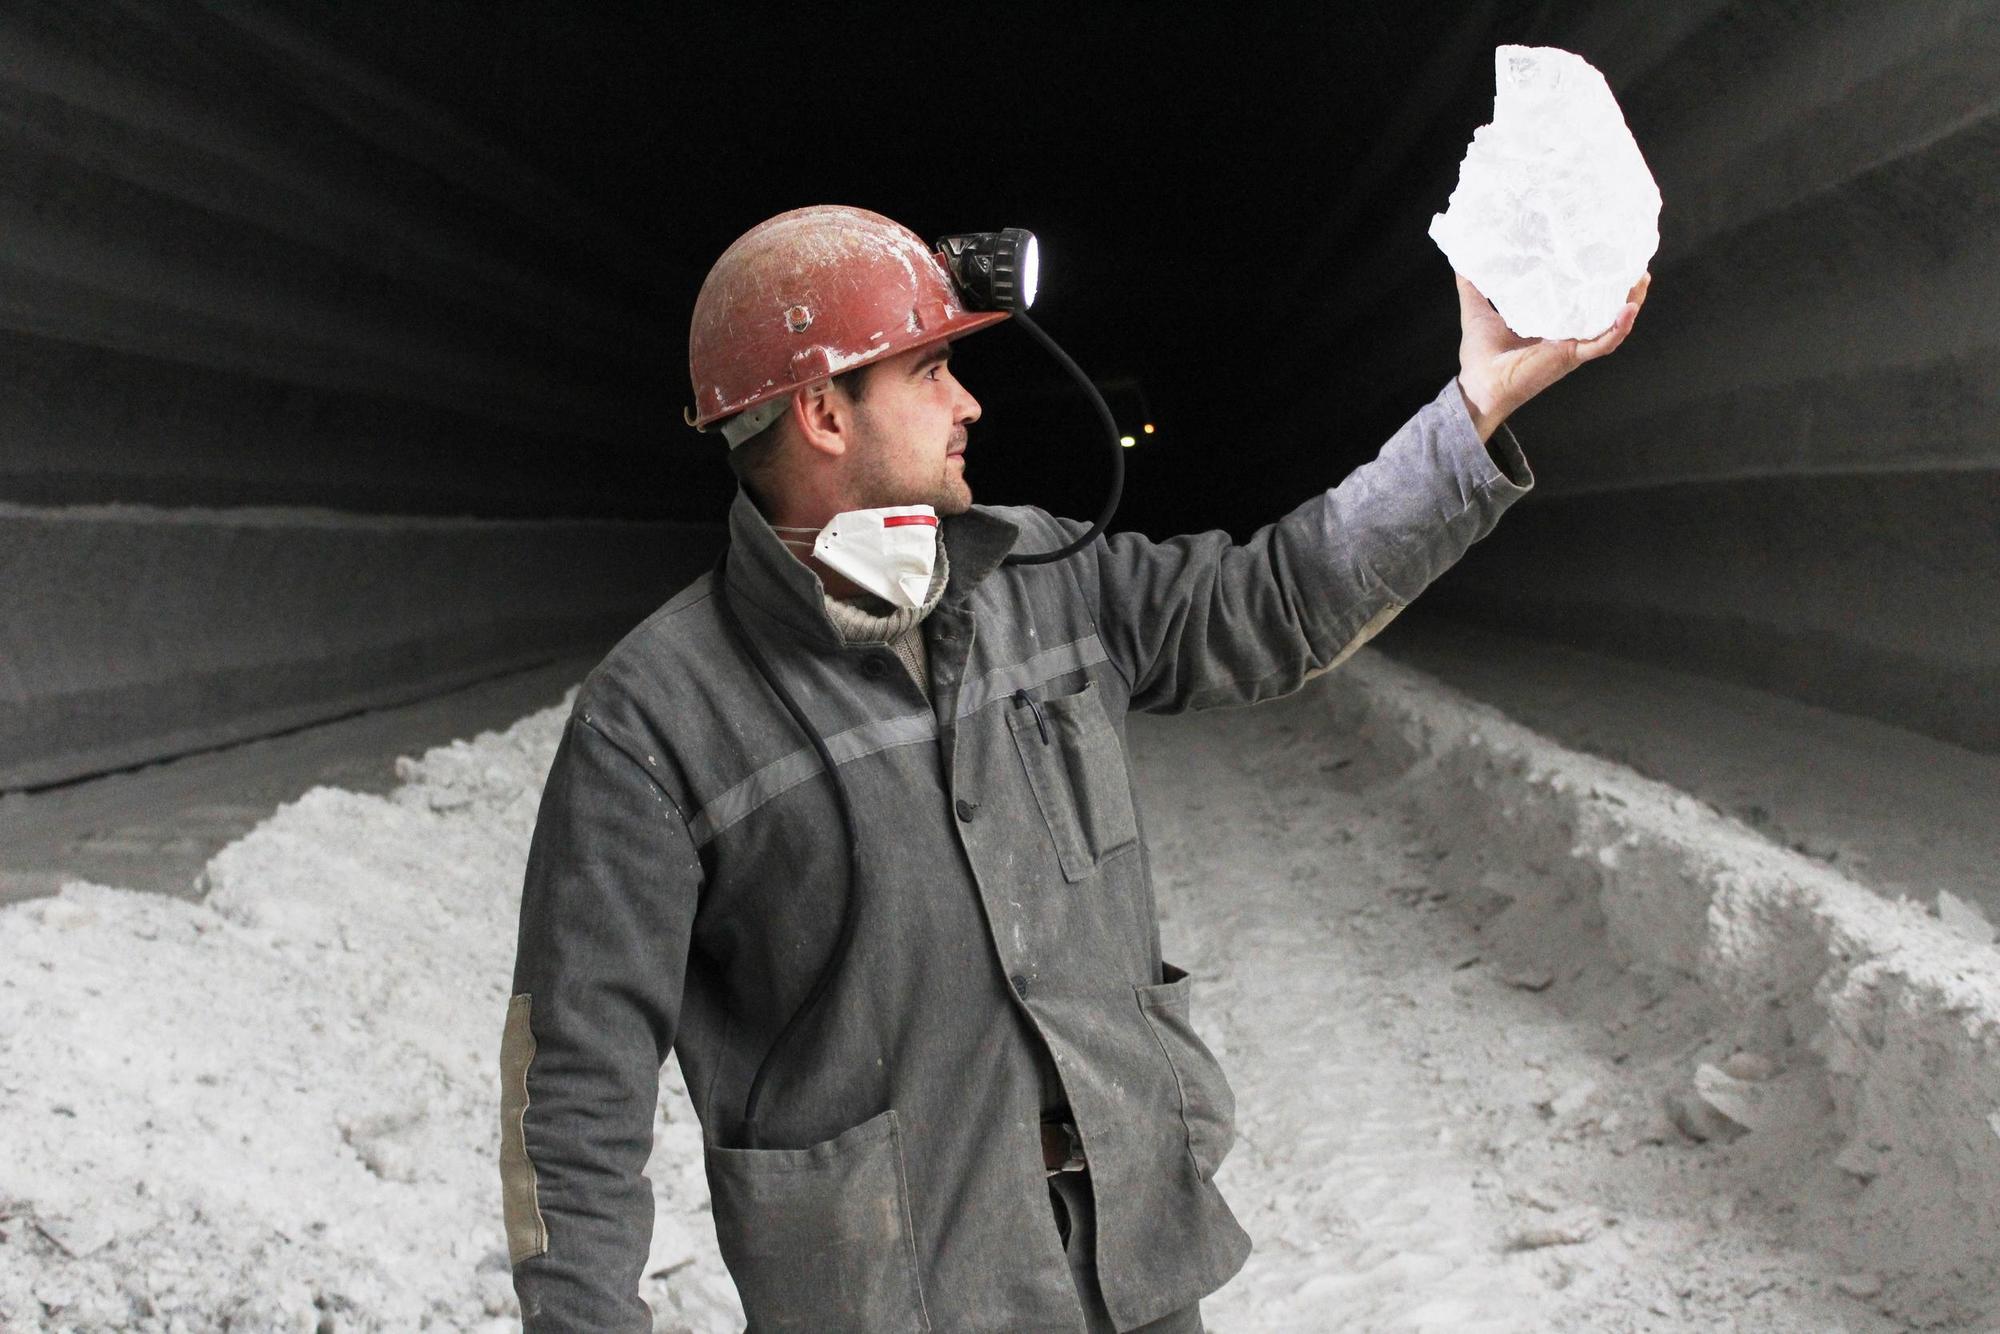 шахтер ГП Артемсоль в шахте в Соледаре